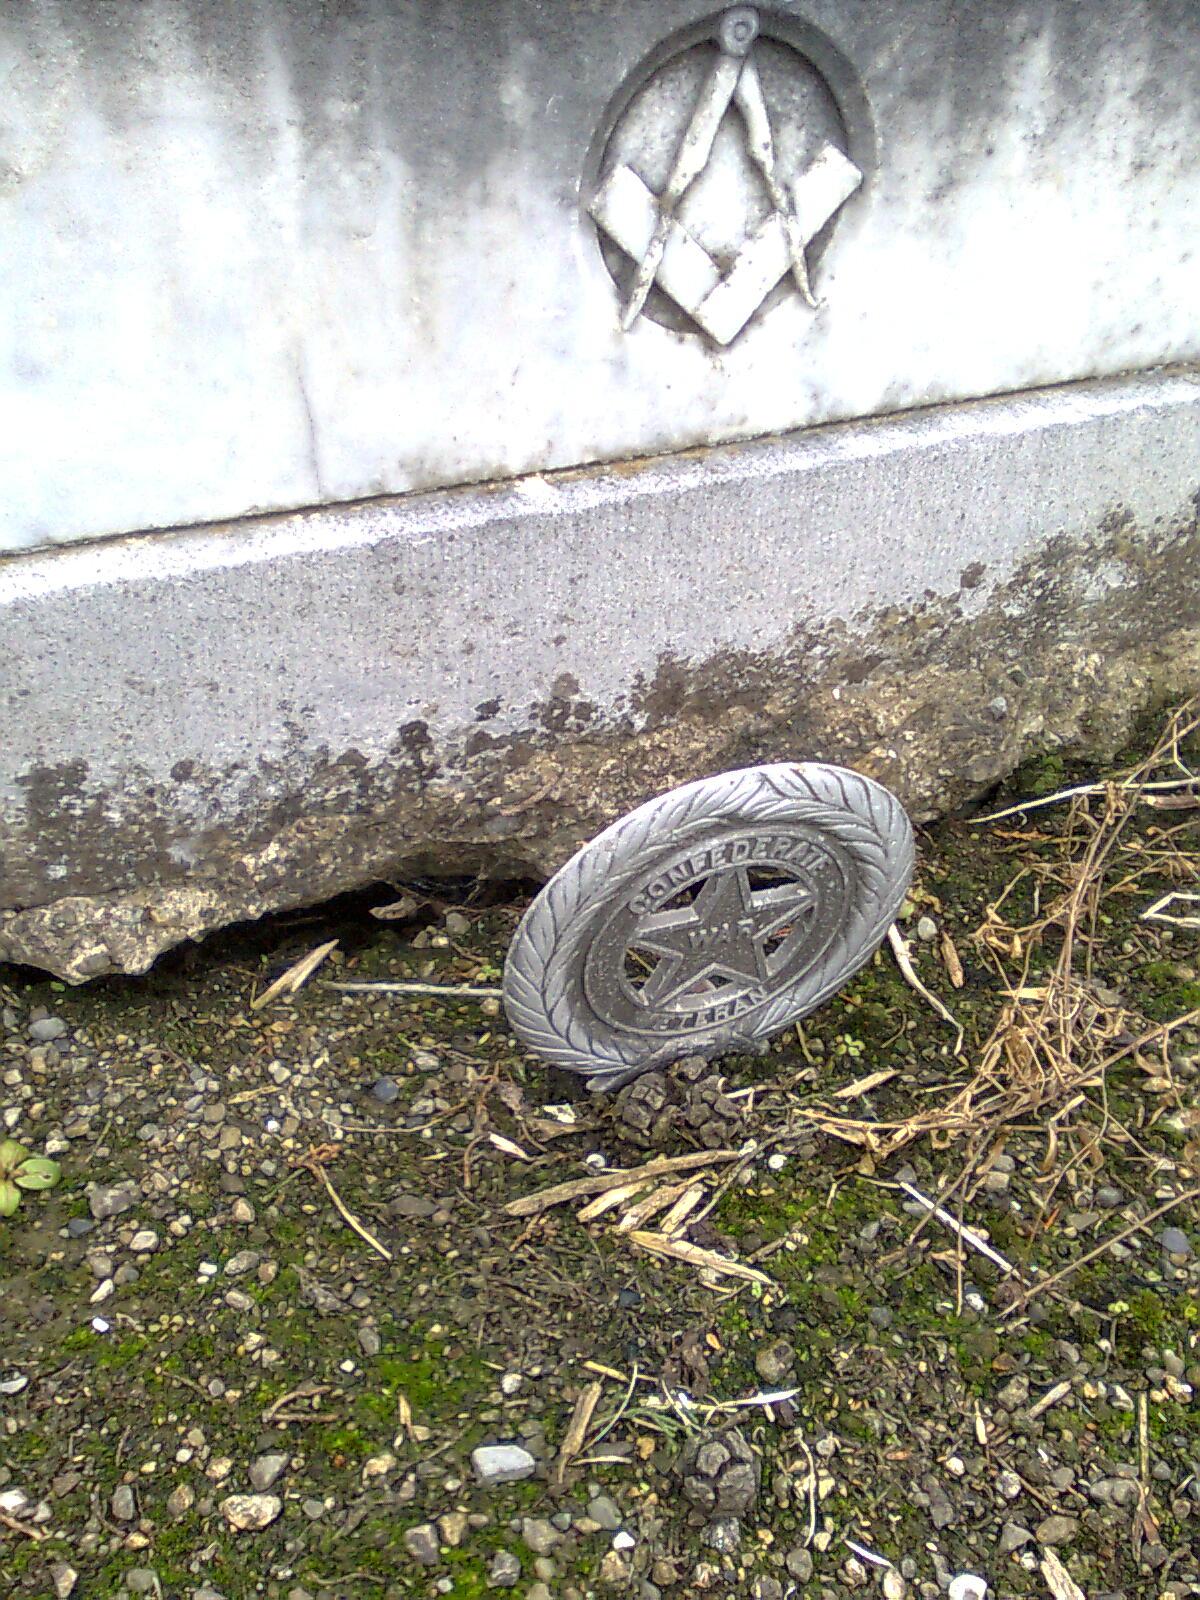 'Confederate Veteran' marker at the grave of Llewellyn Traherne Bassett Saunderson, Deansgrange, Co. Dublin (Photo: Eamonn McLoughlin)